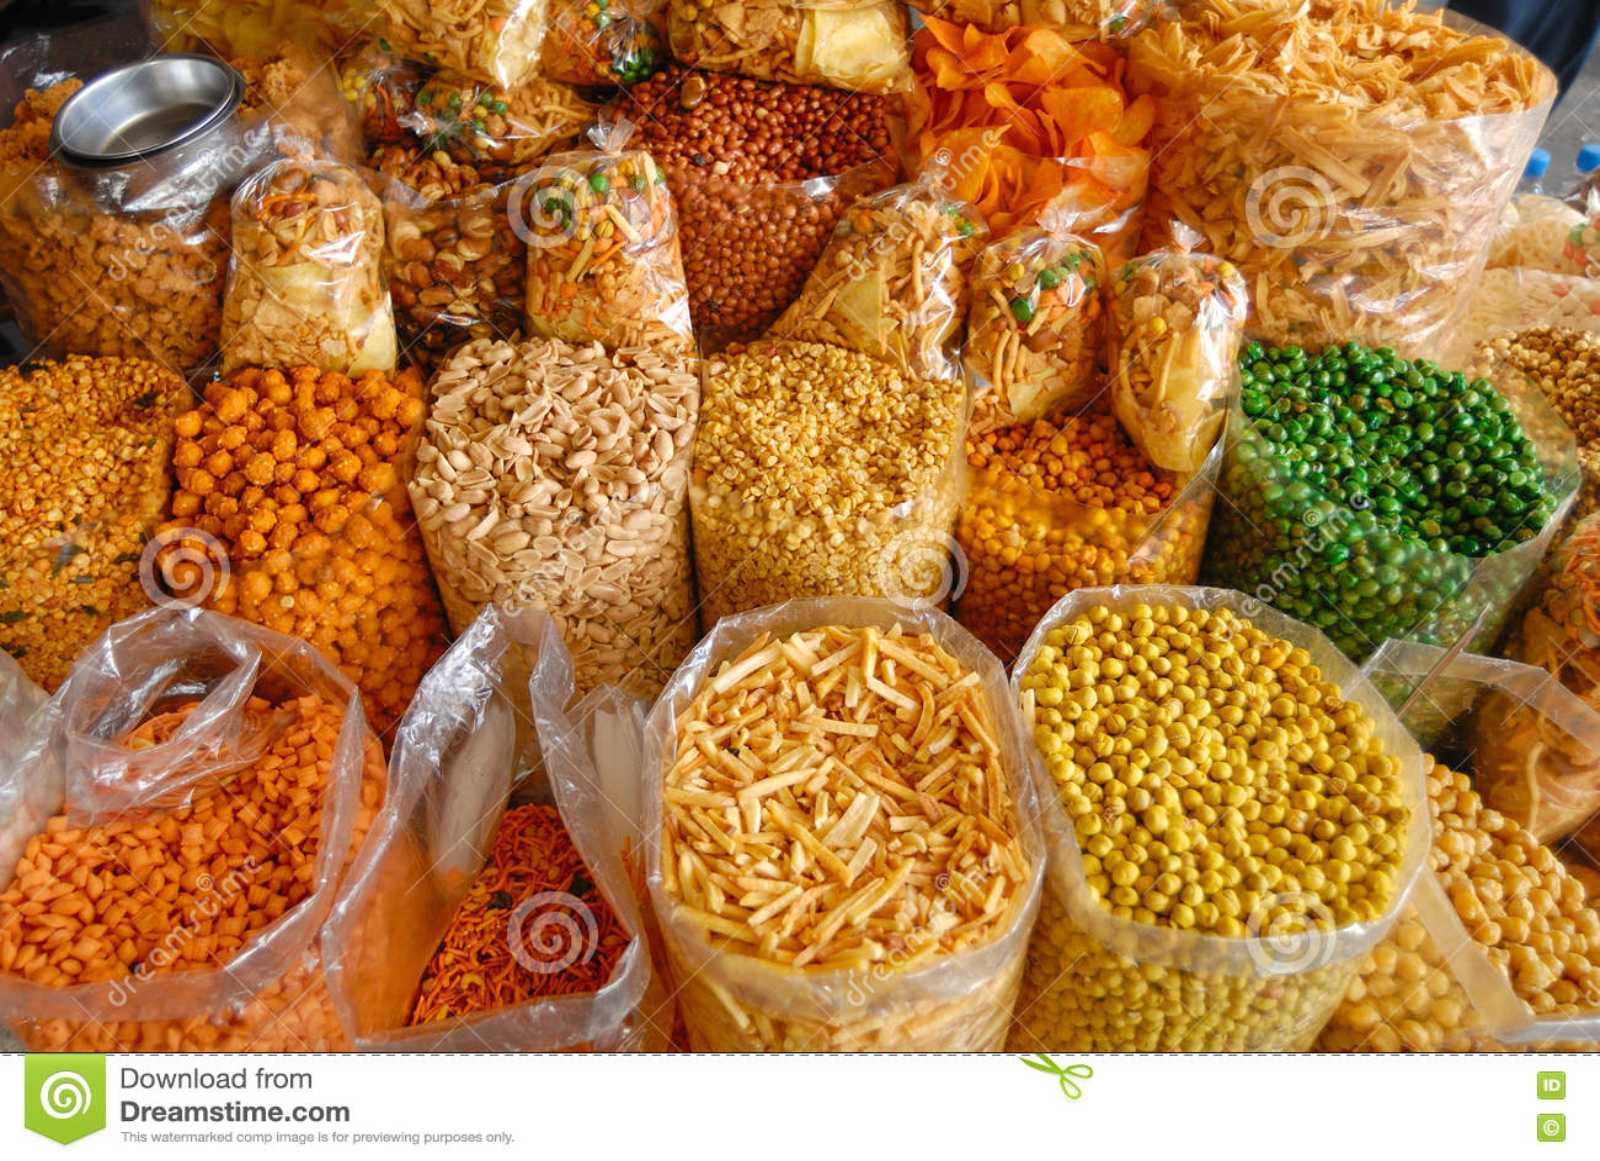 wholesale kacang putih